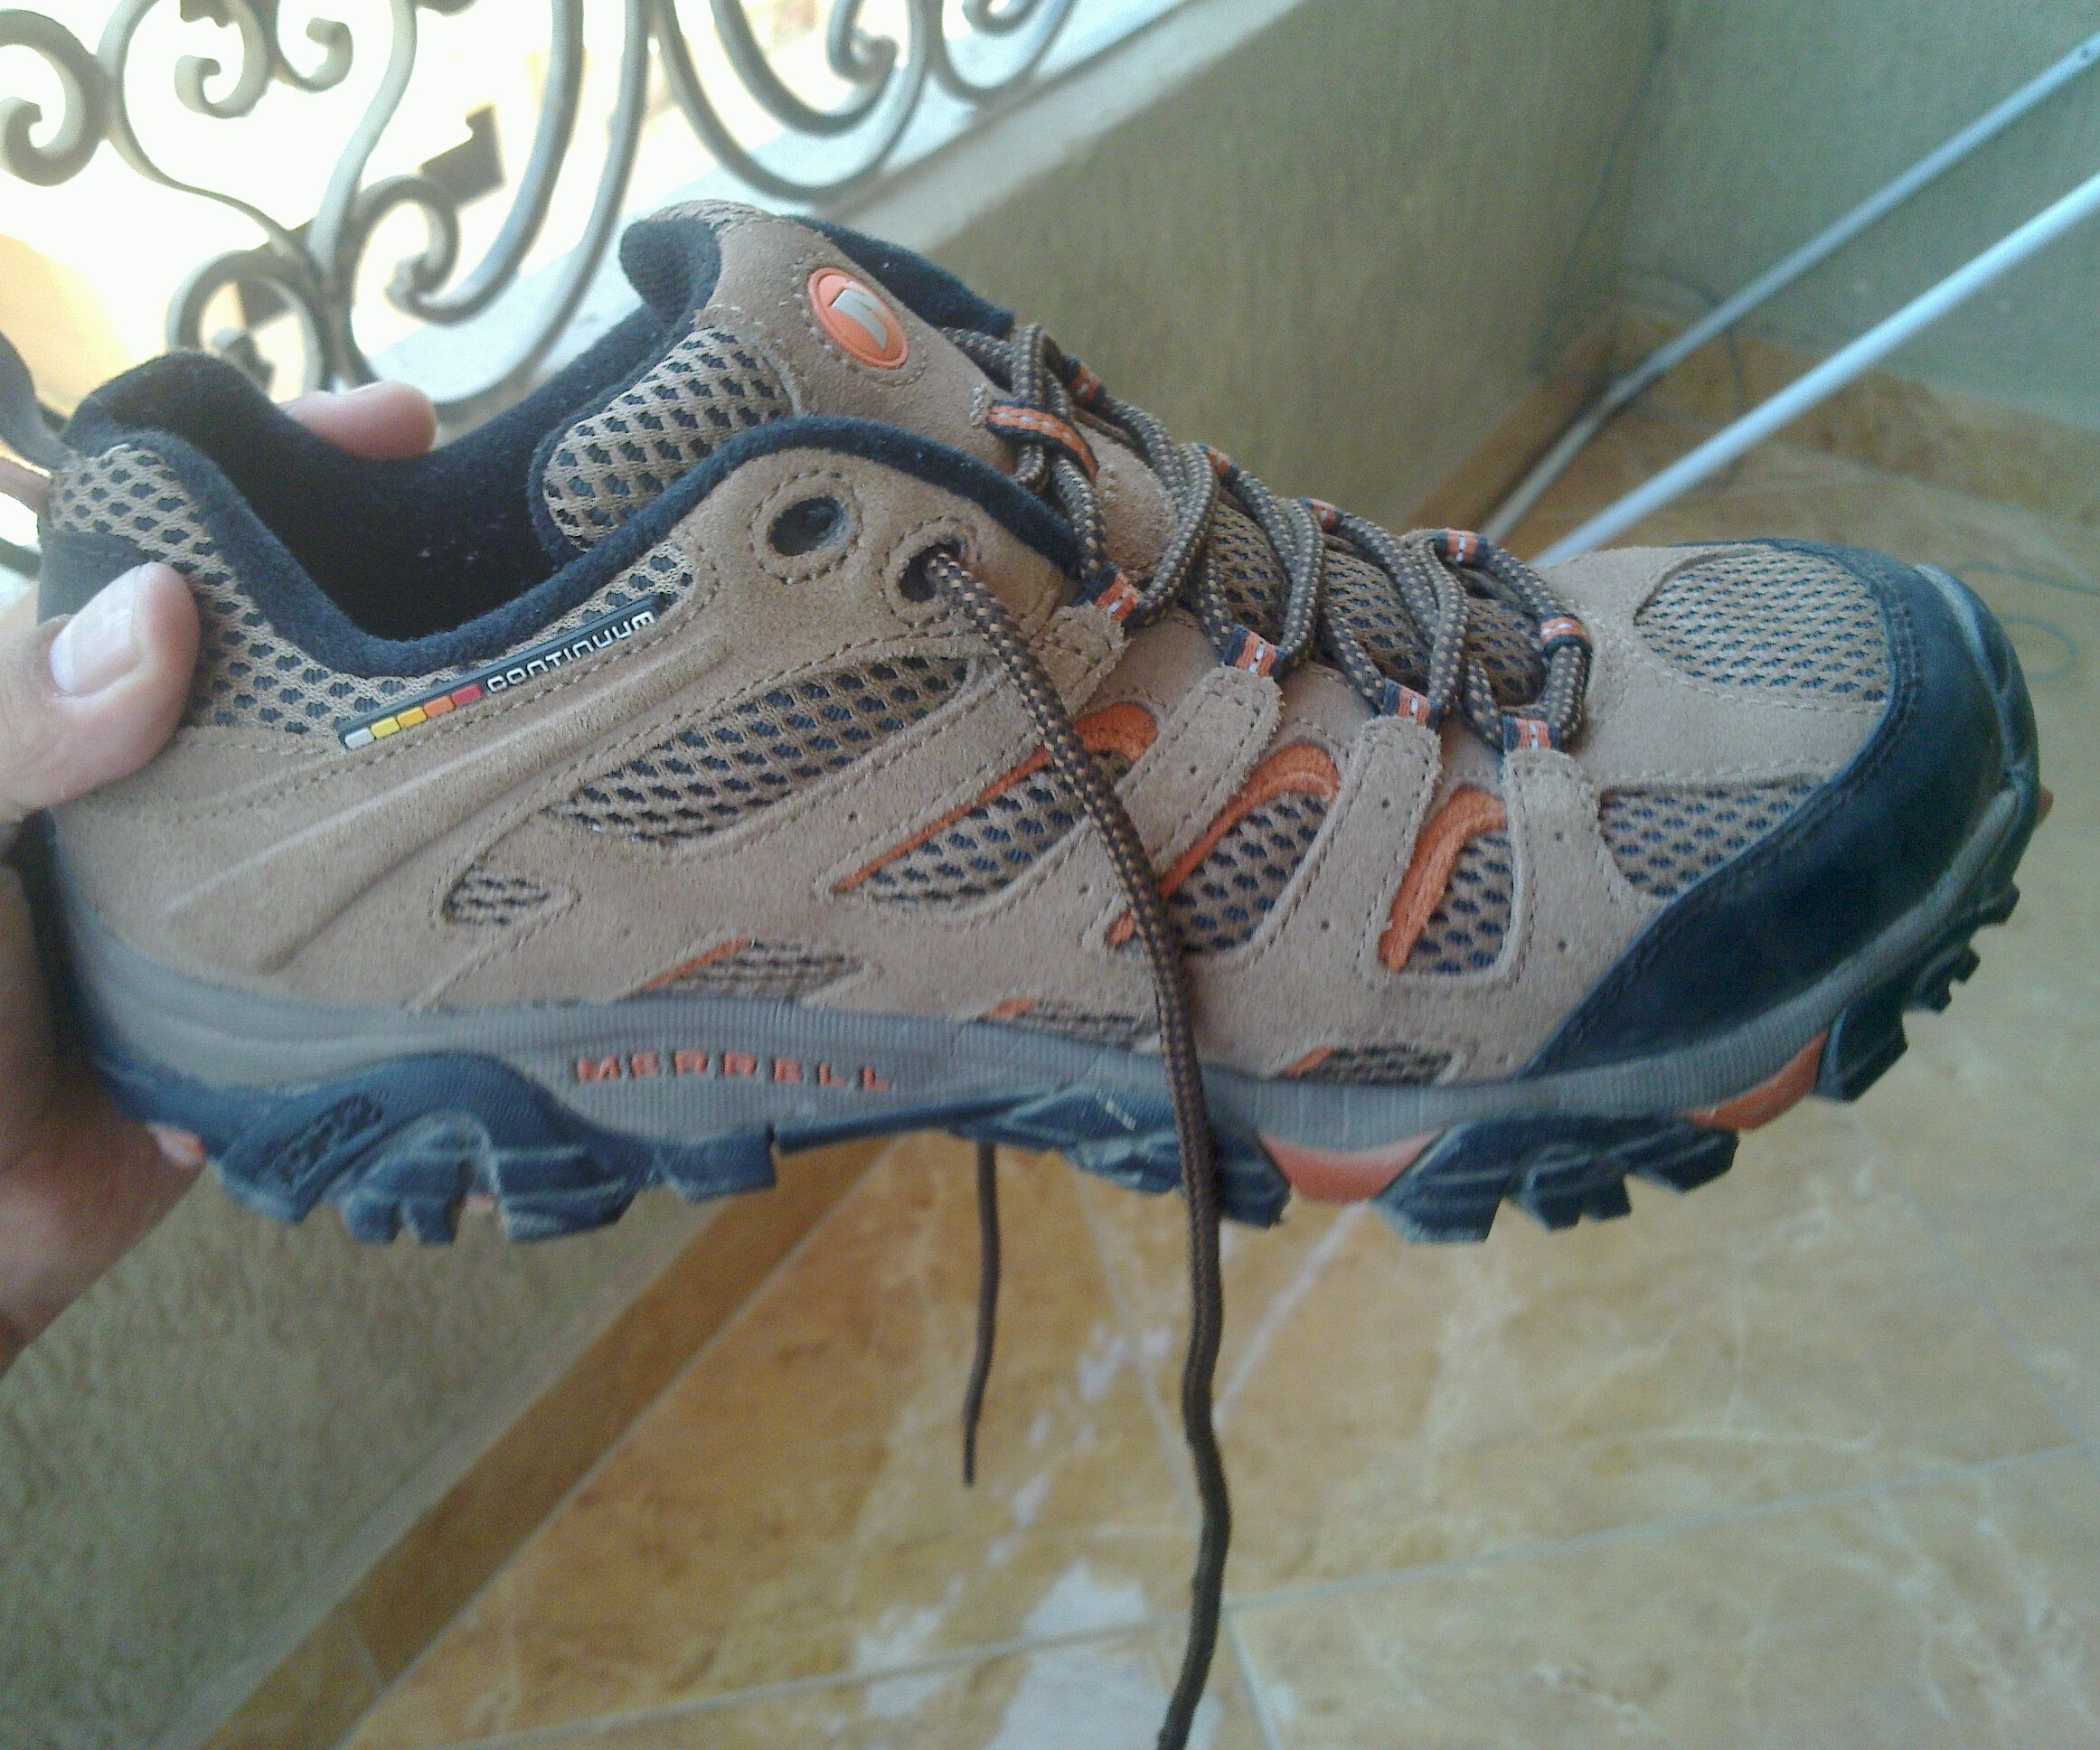 Hack / Break In tight hiking shoes